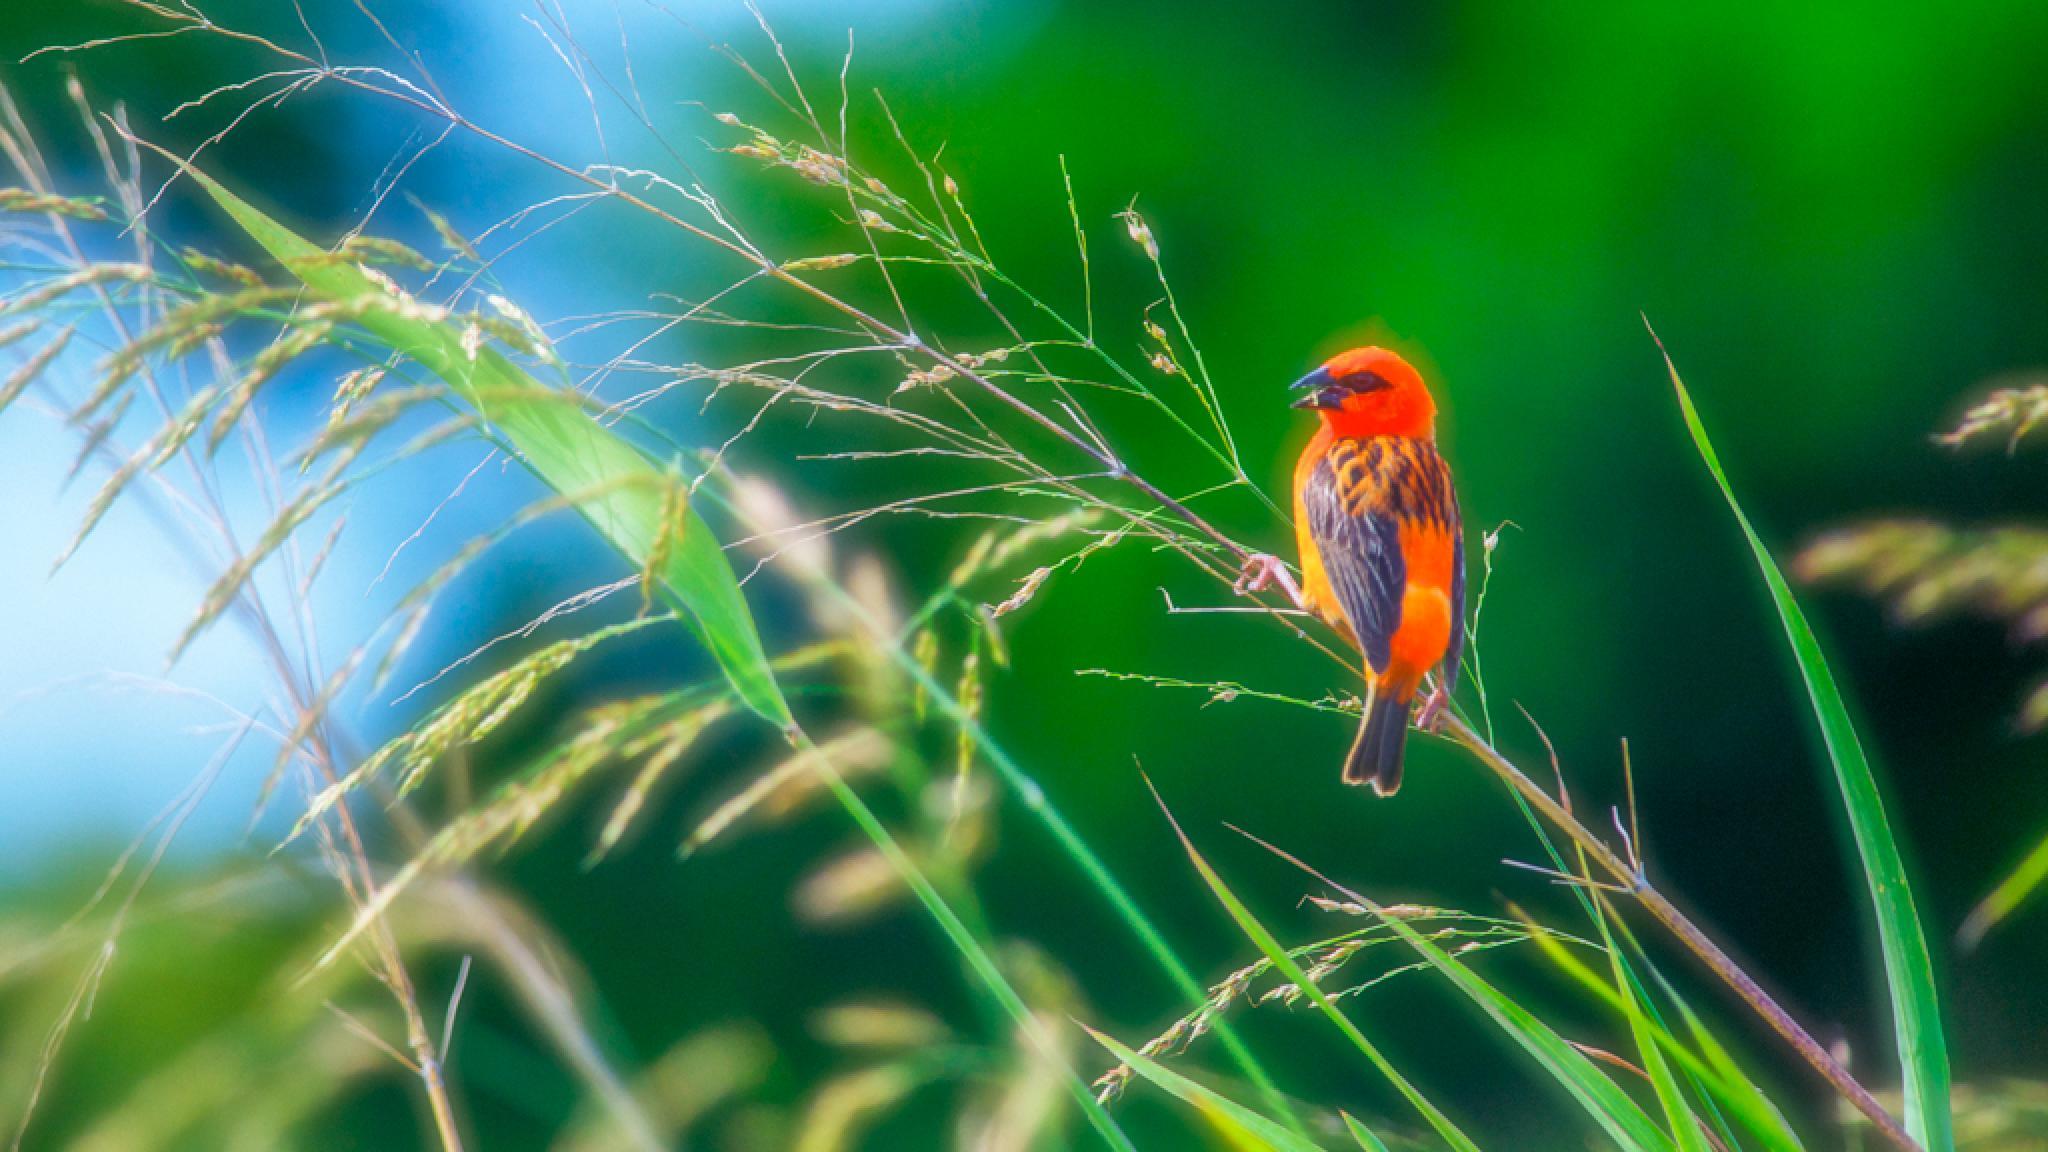 Cardinal ou l'oiseau rouge by desire.lilyman